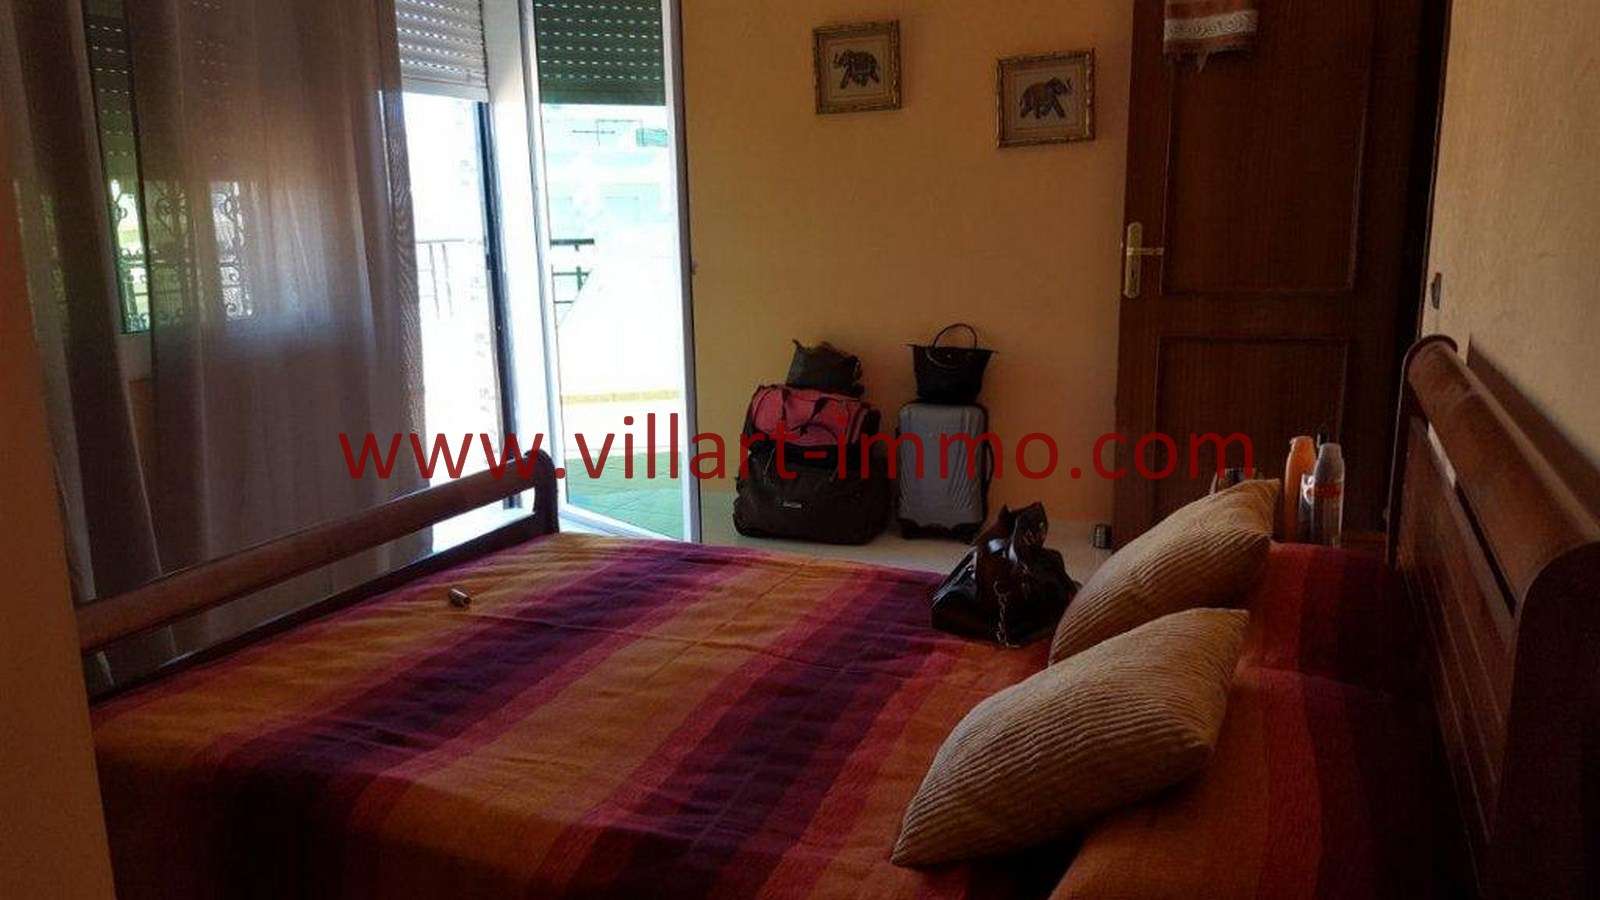 3-Vente-Appartement-Tanger-Chambre à Coucher 1-VA509-Villart Immo